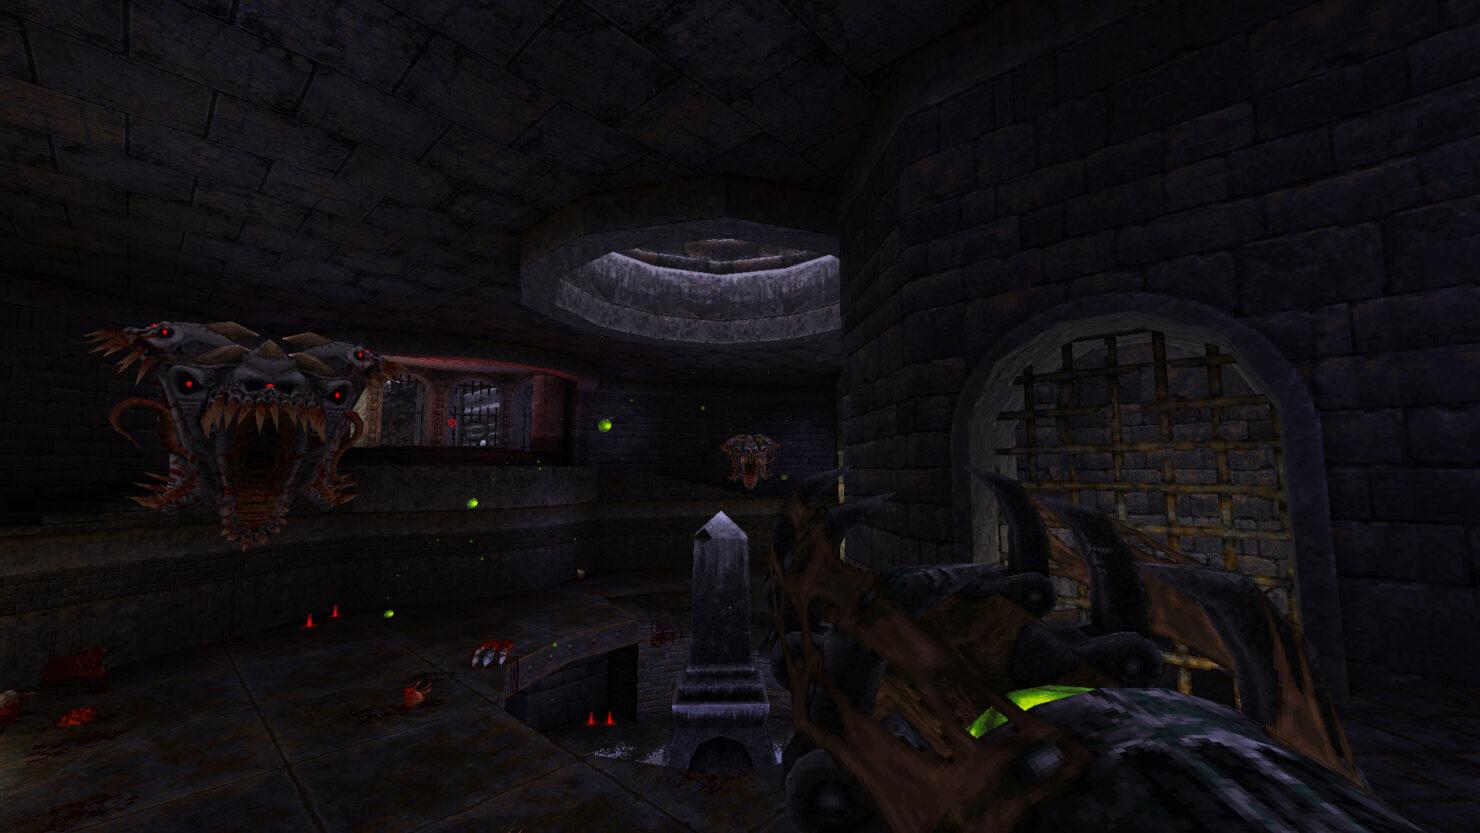 wrath-aeon-of-fury-early-access-launch-02-screenshot-13